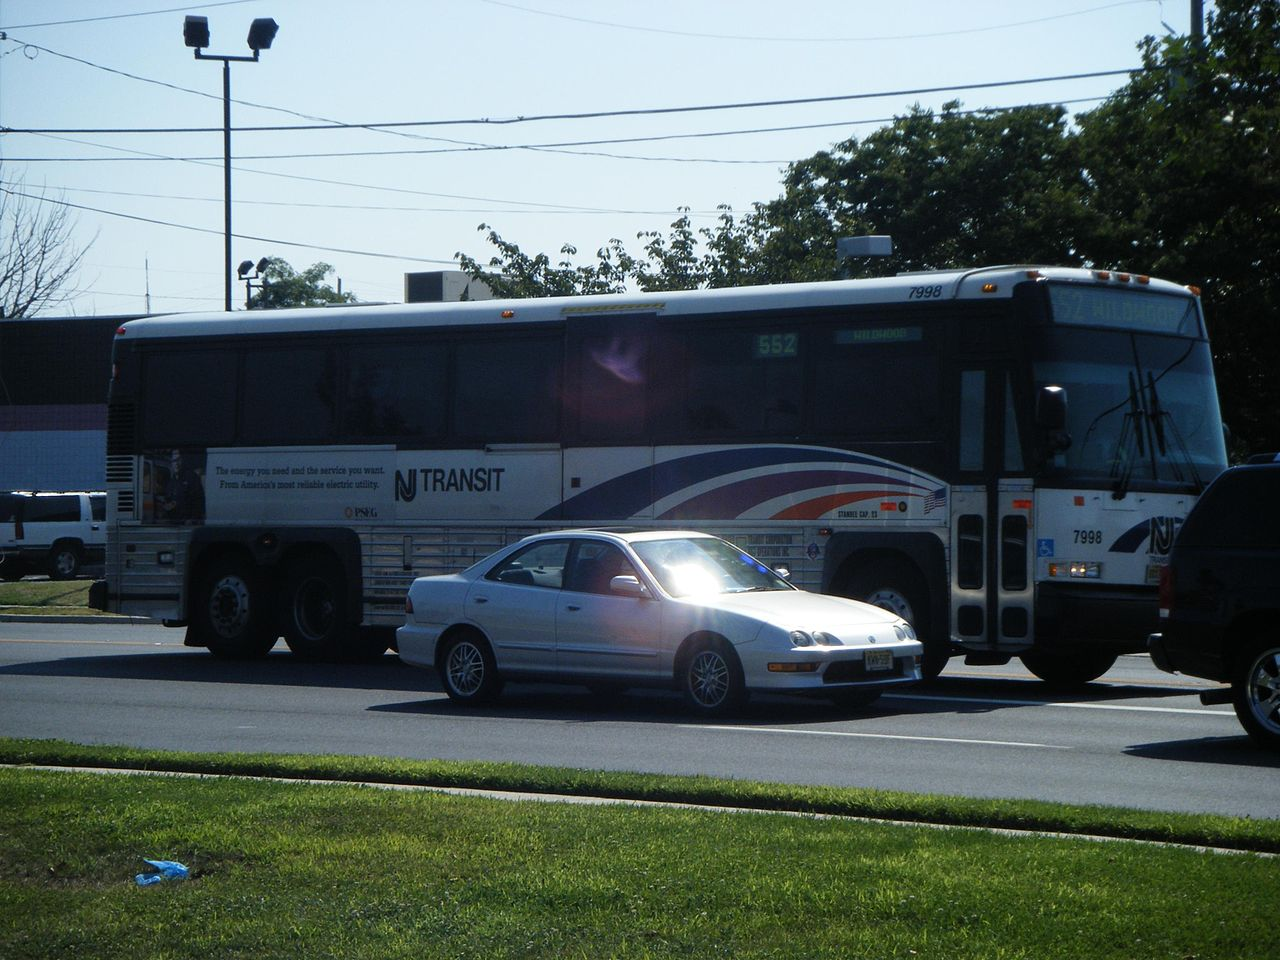 file nj transit bus 7998 us 9 rio grande jpg wikimedia commons. Black Bedroom Furniture Sets. Home Design Ideas